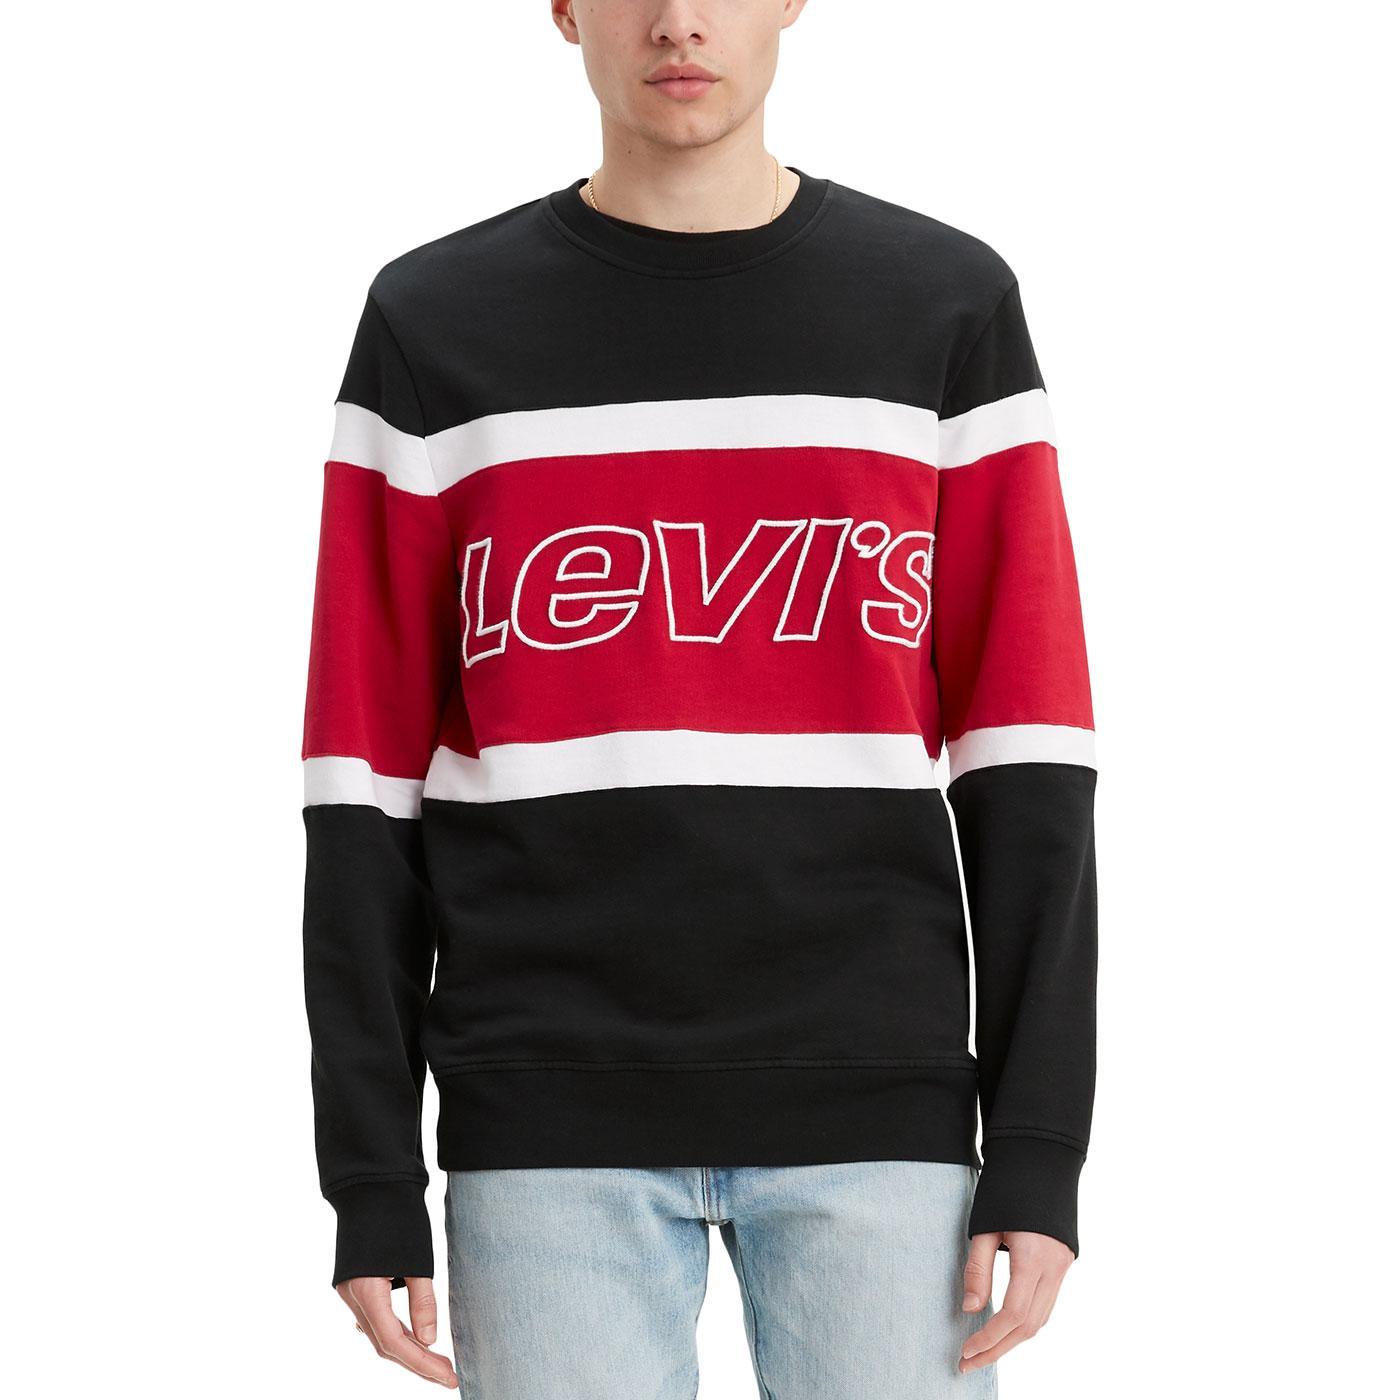 LEVI'S Retro 90s Indie Colour Block Sweatshirt N/R